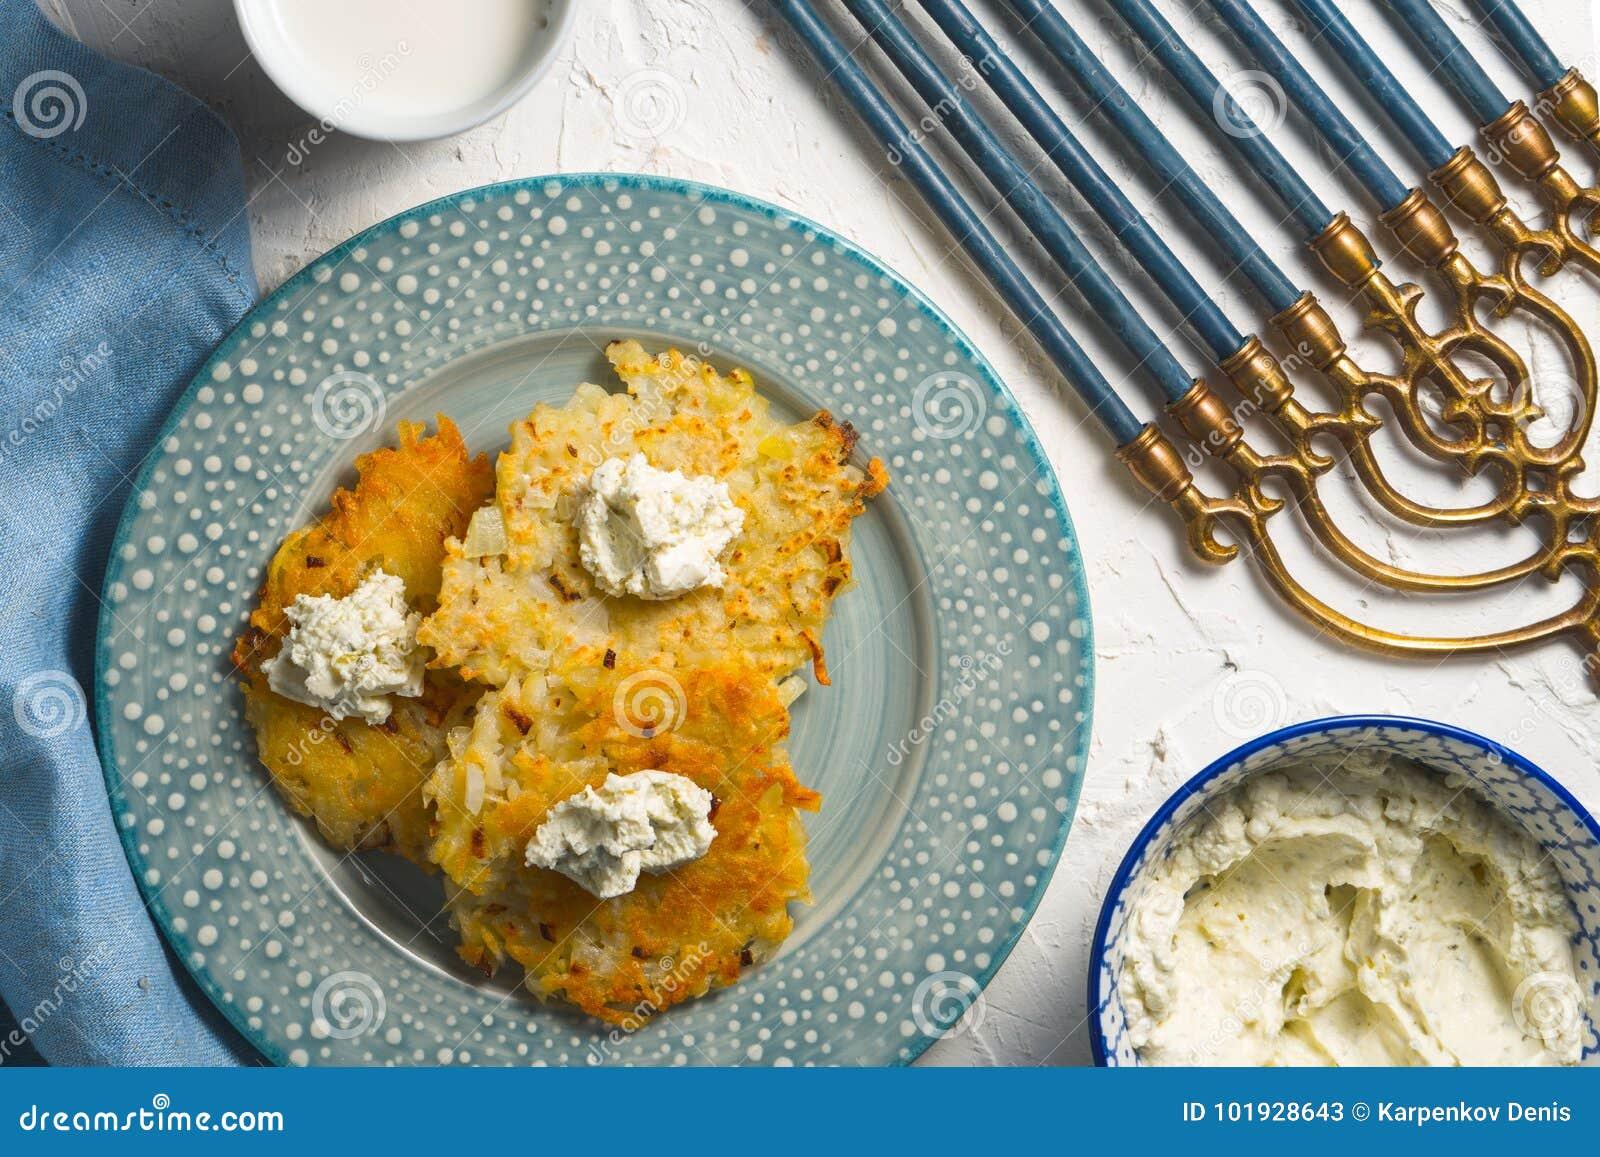 Latkes и сыр творога на плите и на голубой салфетке, chanukia